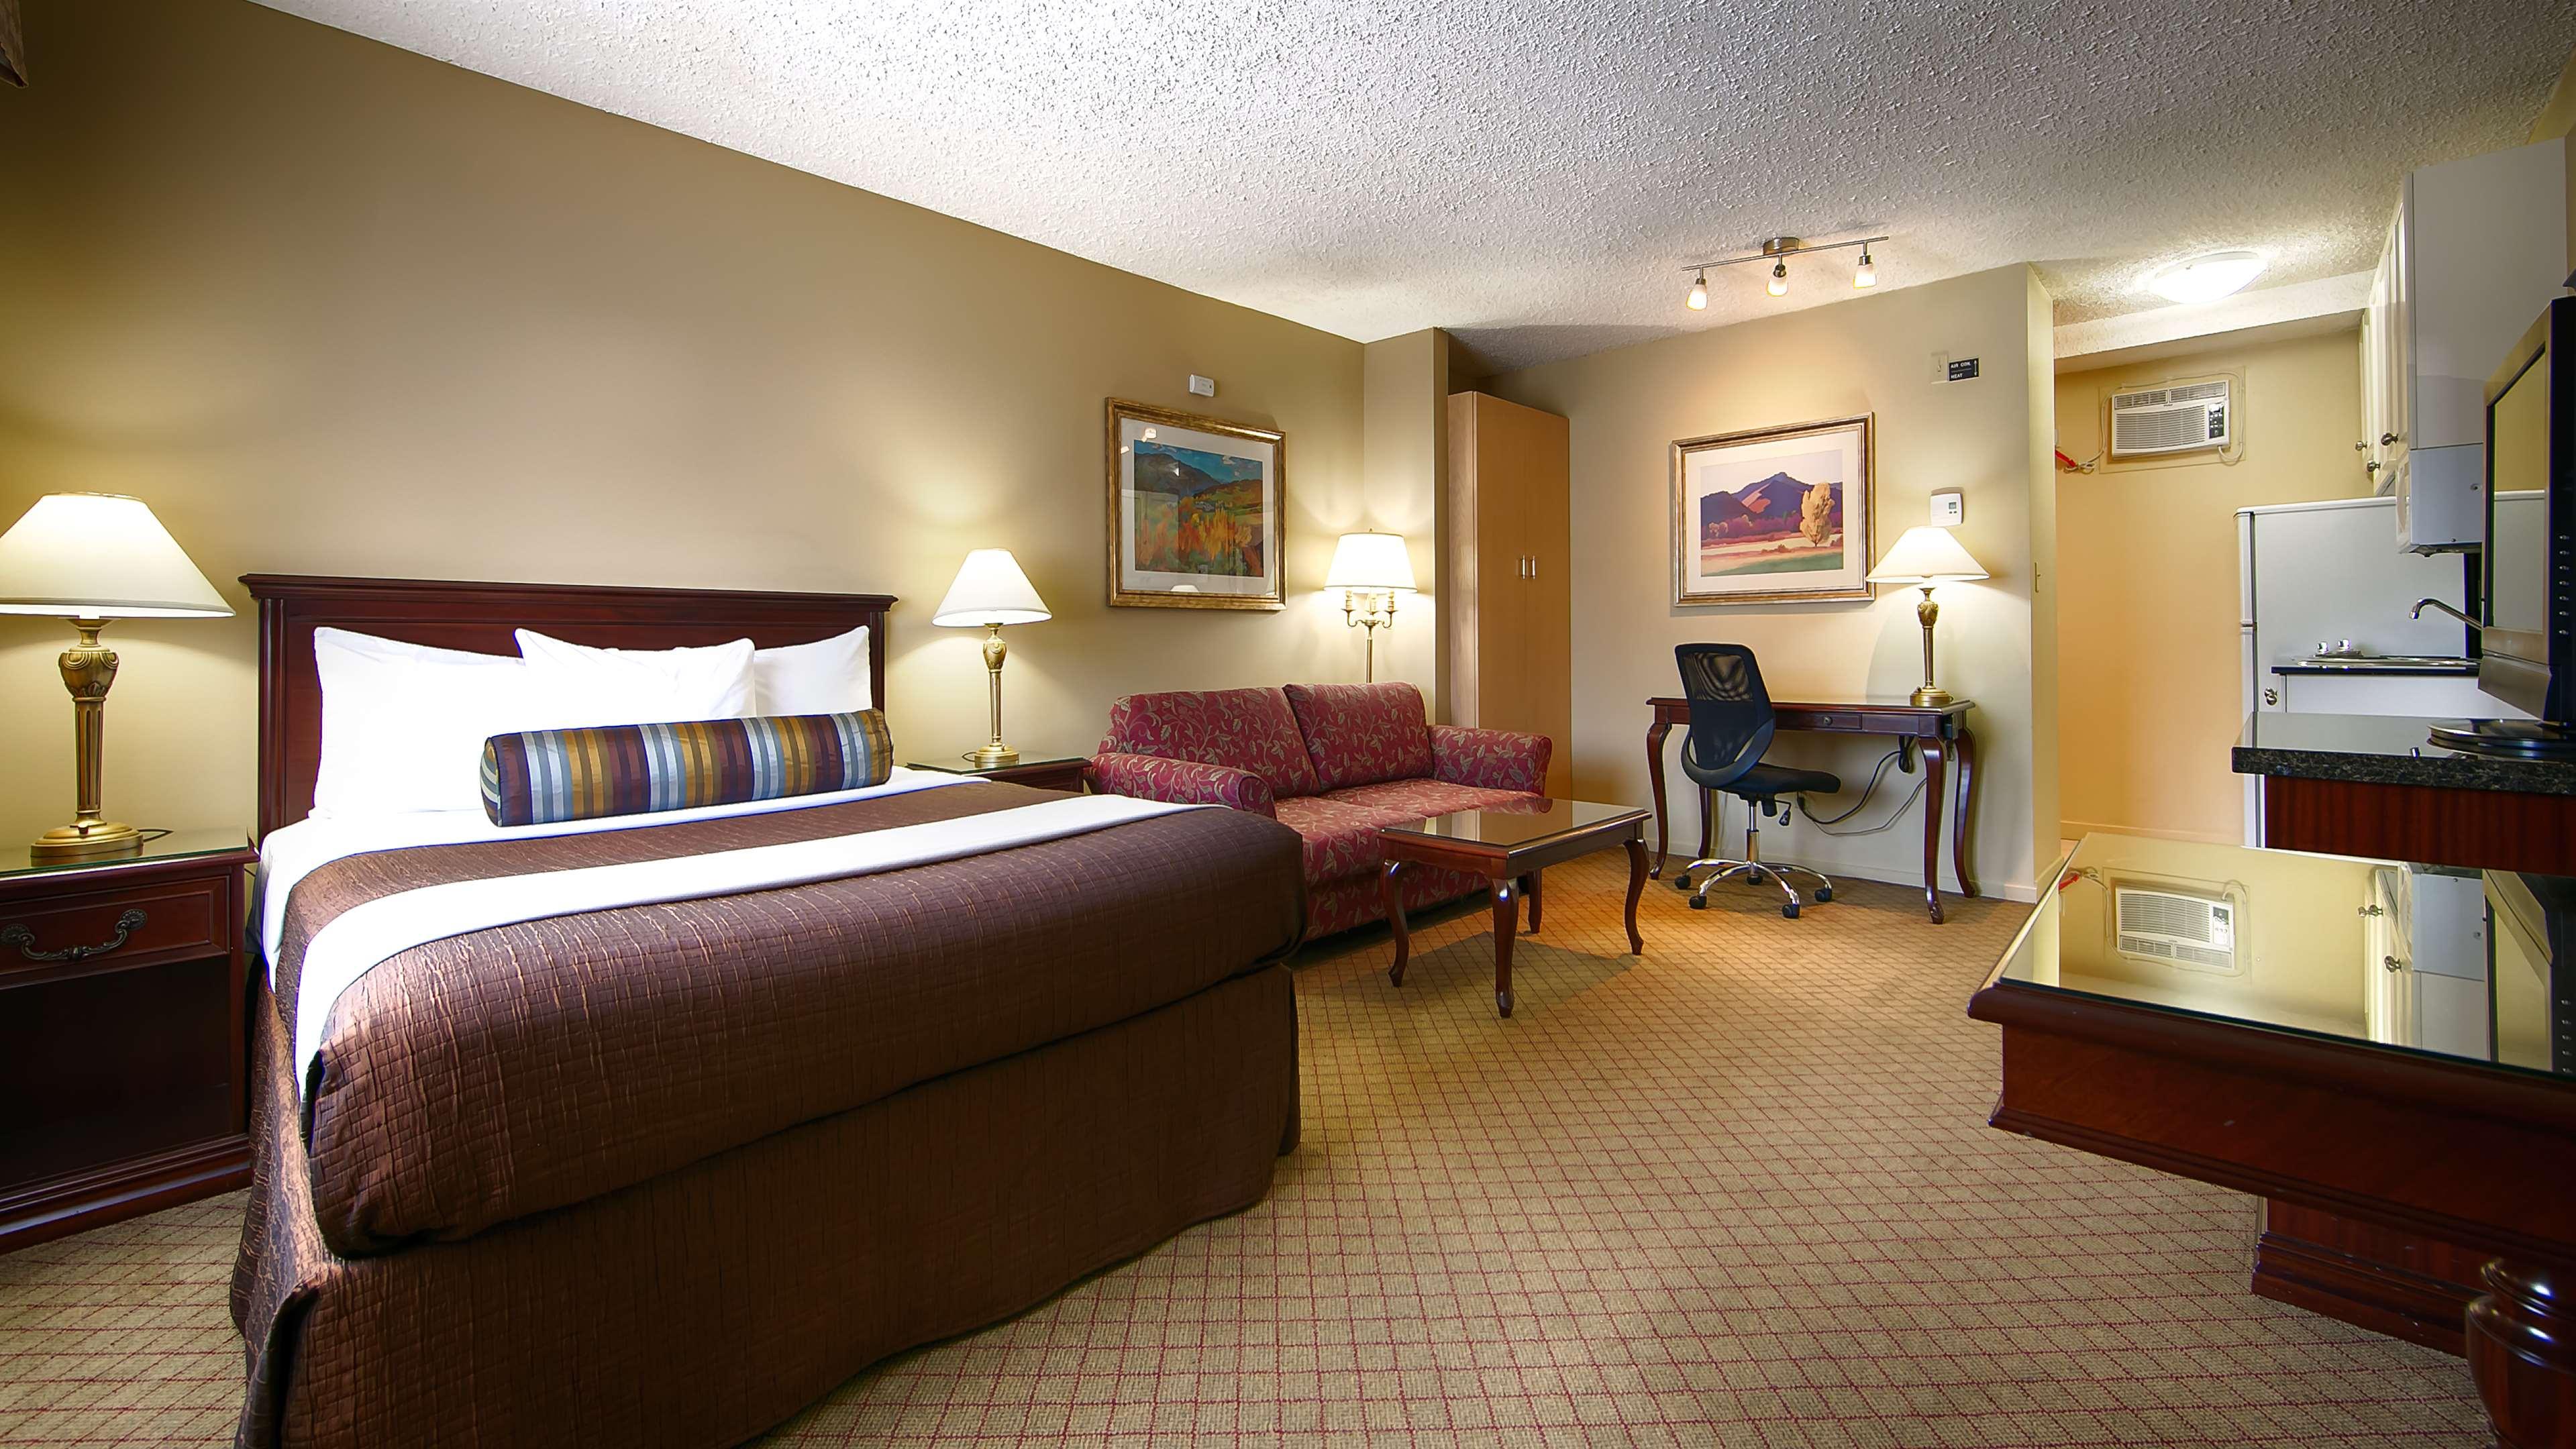 Best Western Bakerview Inn in Abbotsford: Kitchenette Guest Room